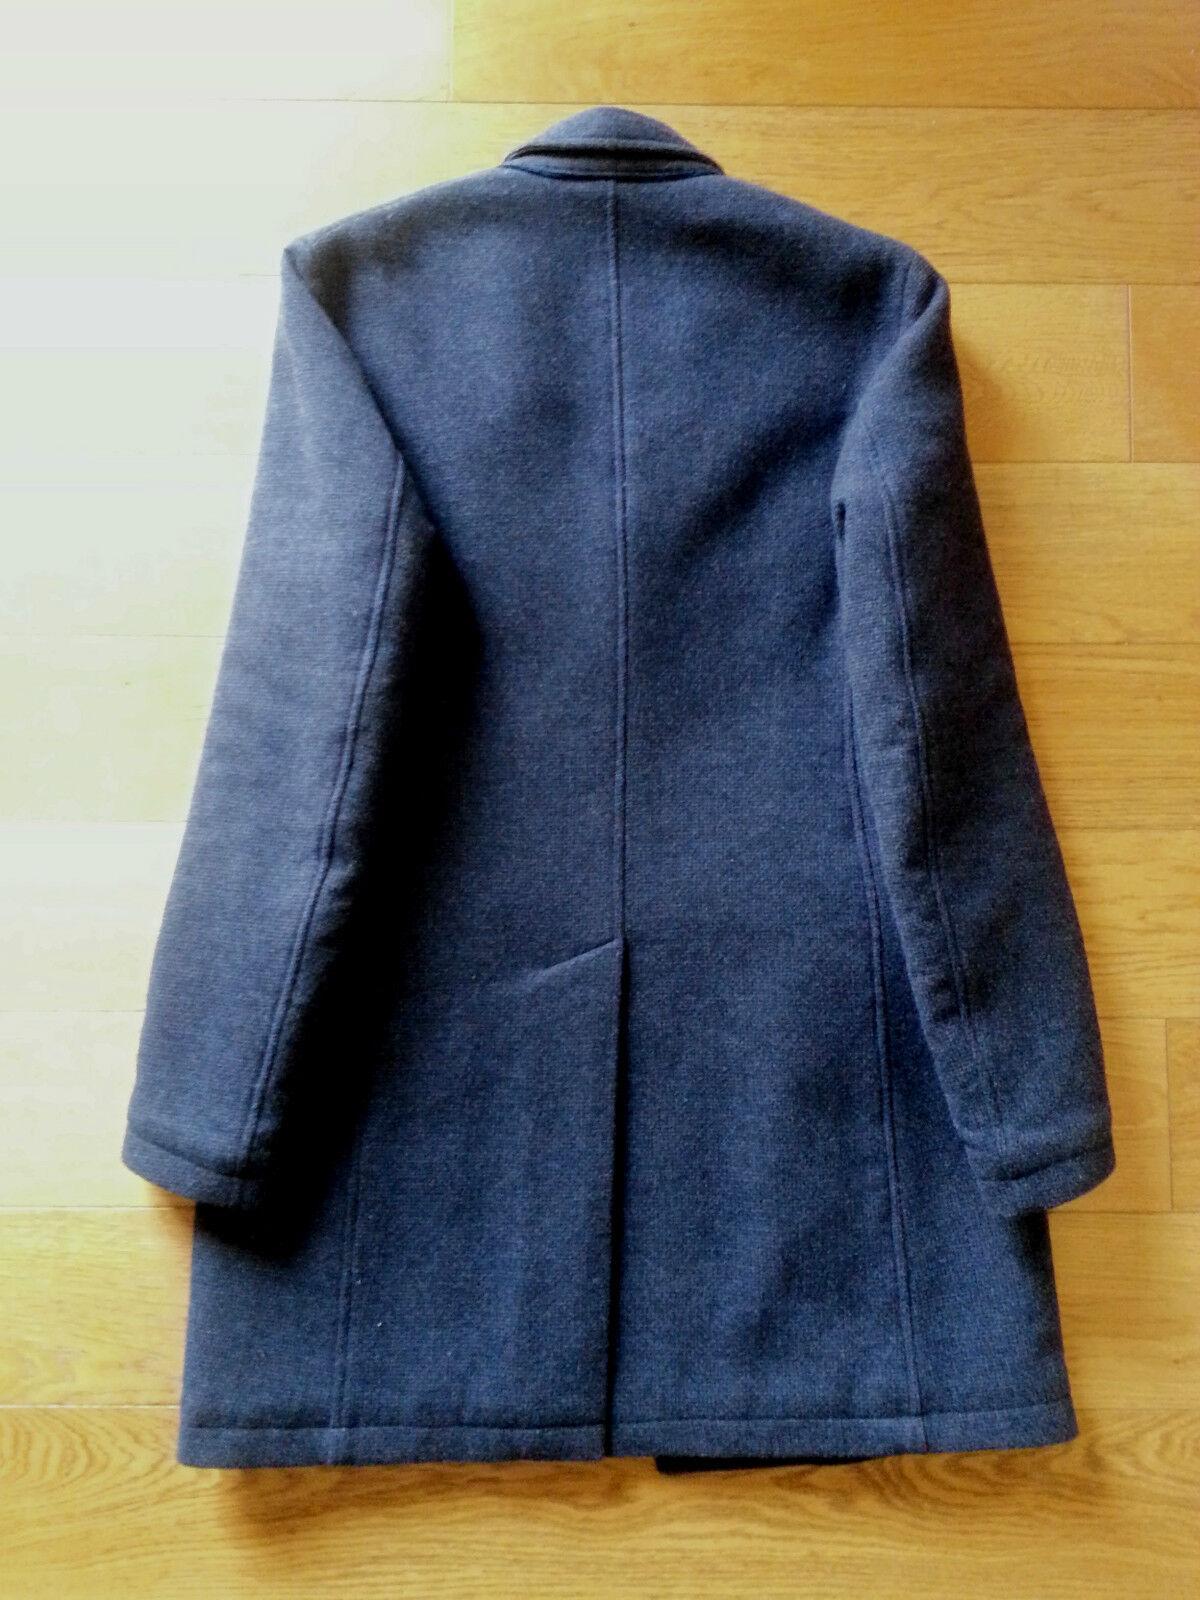 Aquarama cappotto lana uomo capospalla in giaccone 48 made in capospalla italy coat Uomo wool 7bb5c2